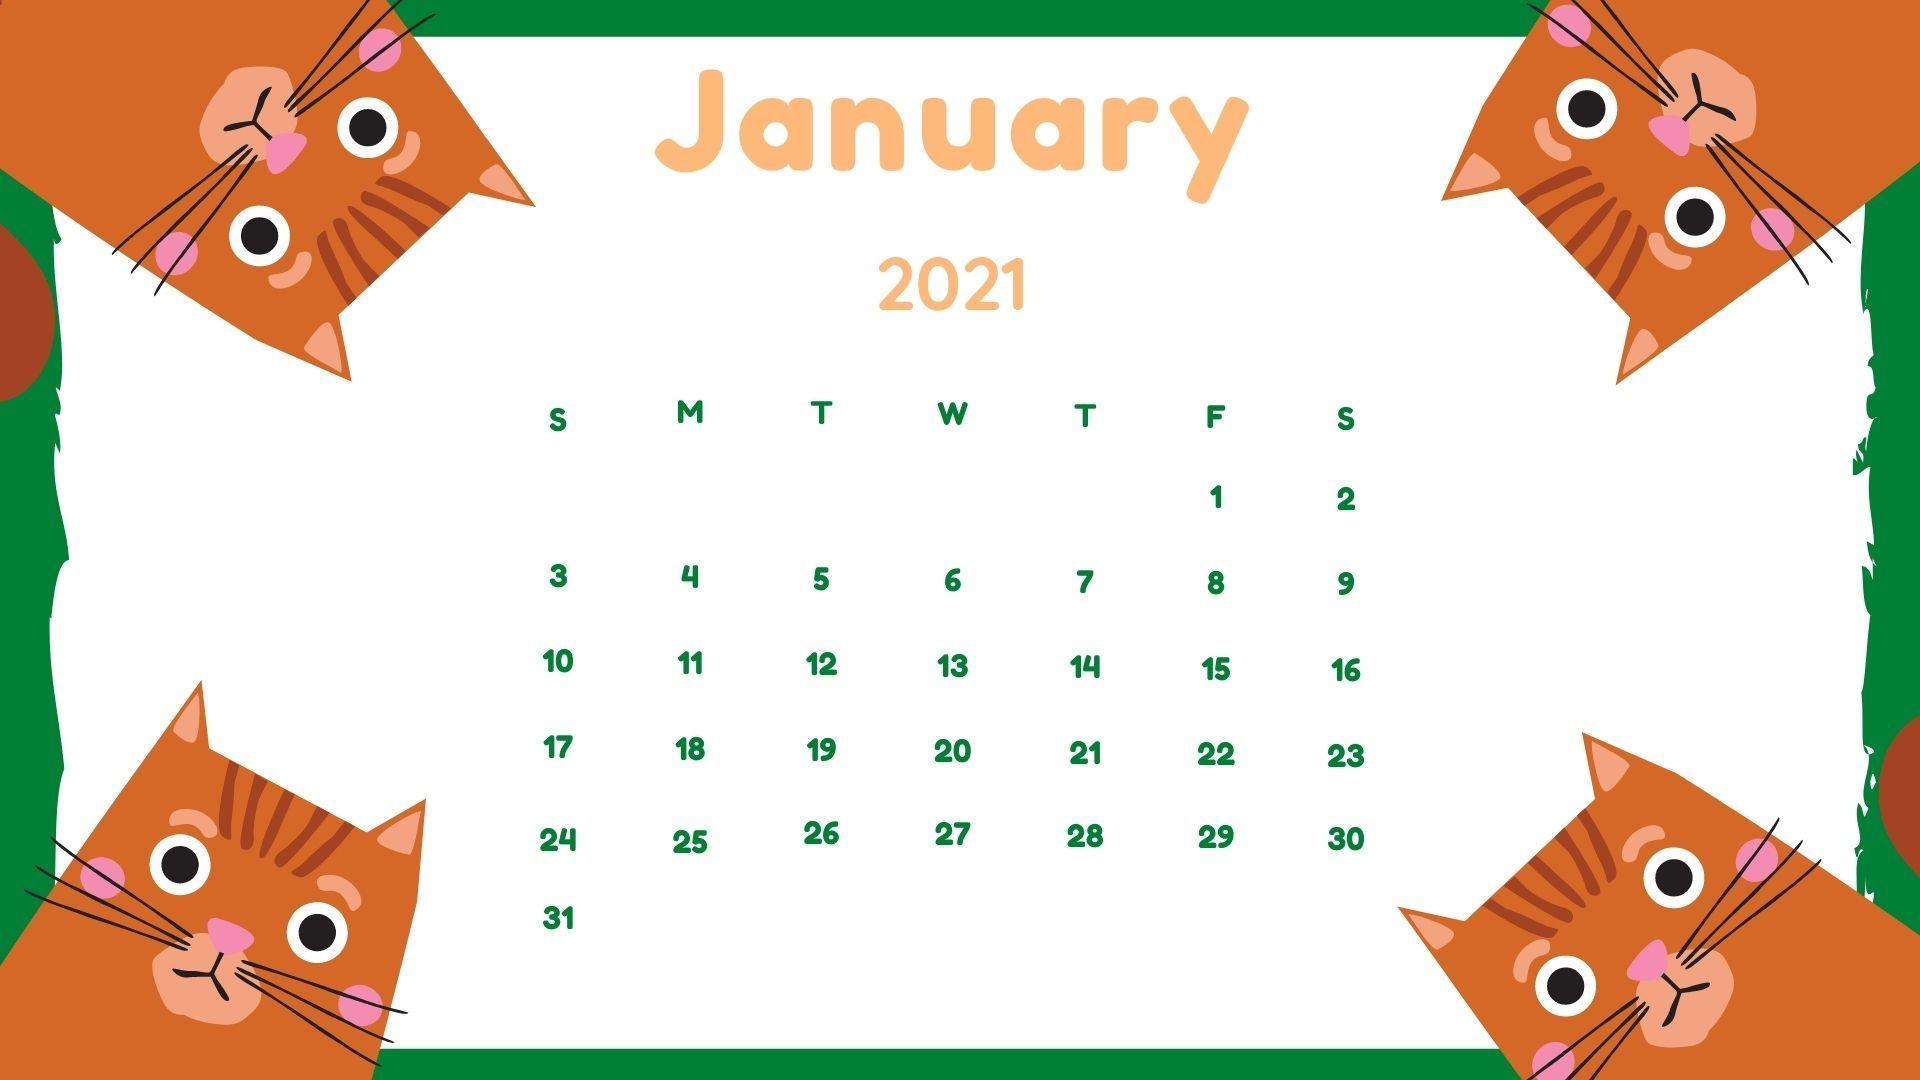 January 2021 Calendar Wallpapers 1920x1080